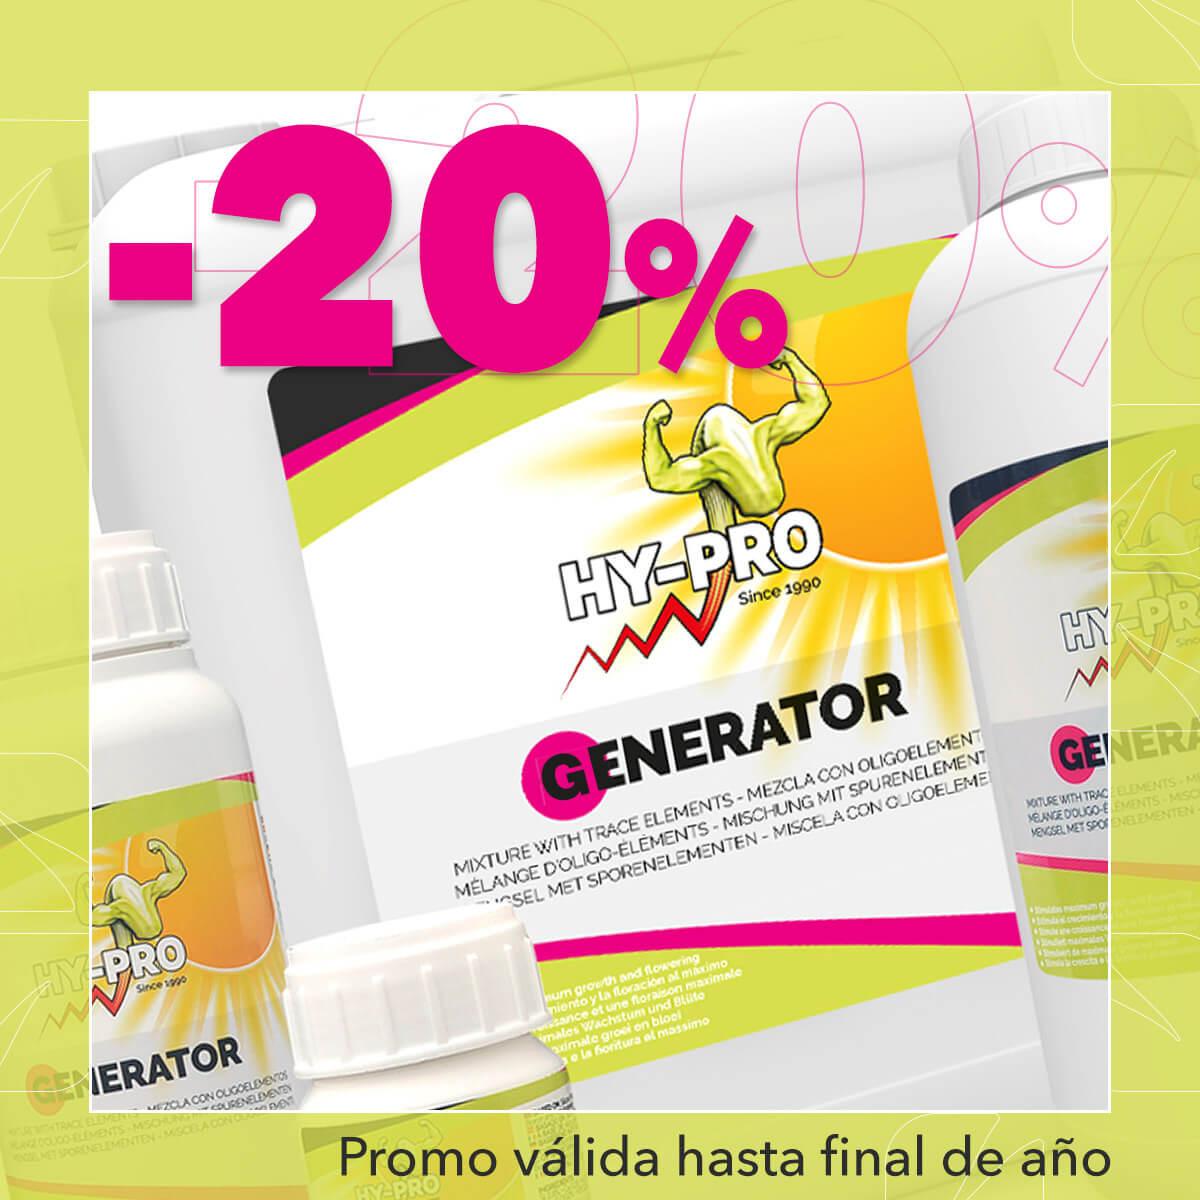 Hy Pro Generator 20%